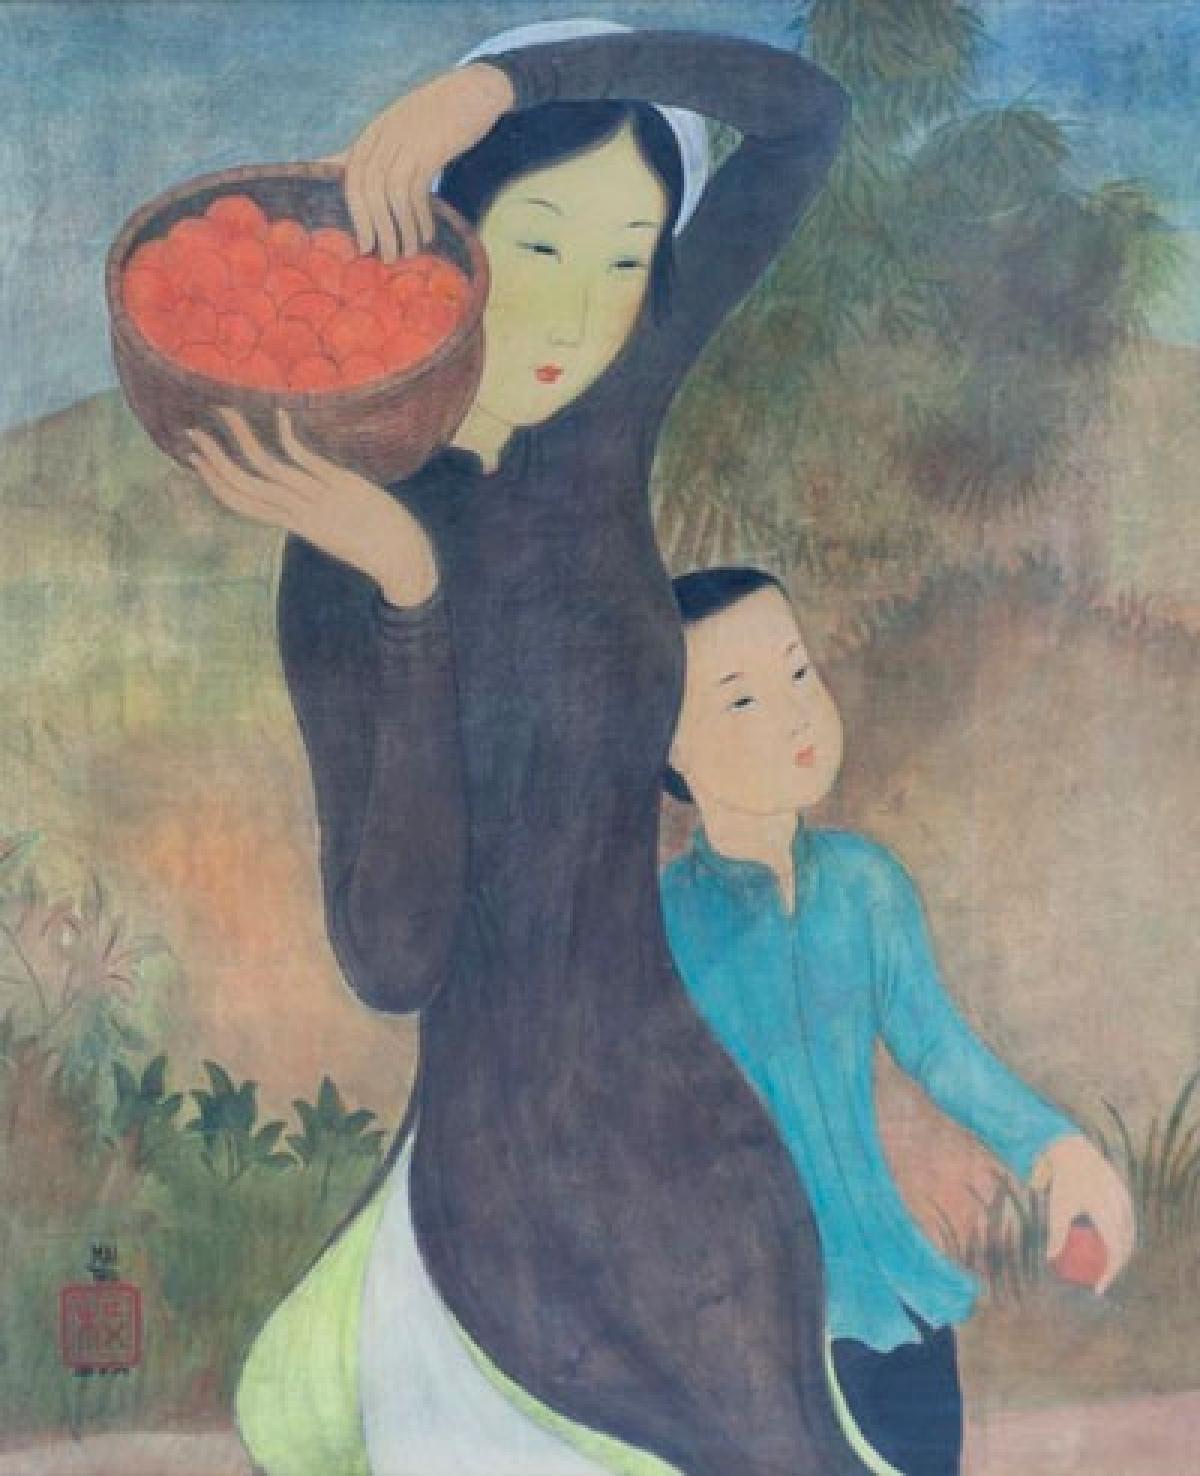 The artwork Mère et Enfant, panier de fruits (Mother and Child, fruit basket) by Mai Trung Thu. Photo courtesy of the exhibition.